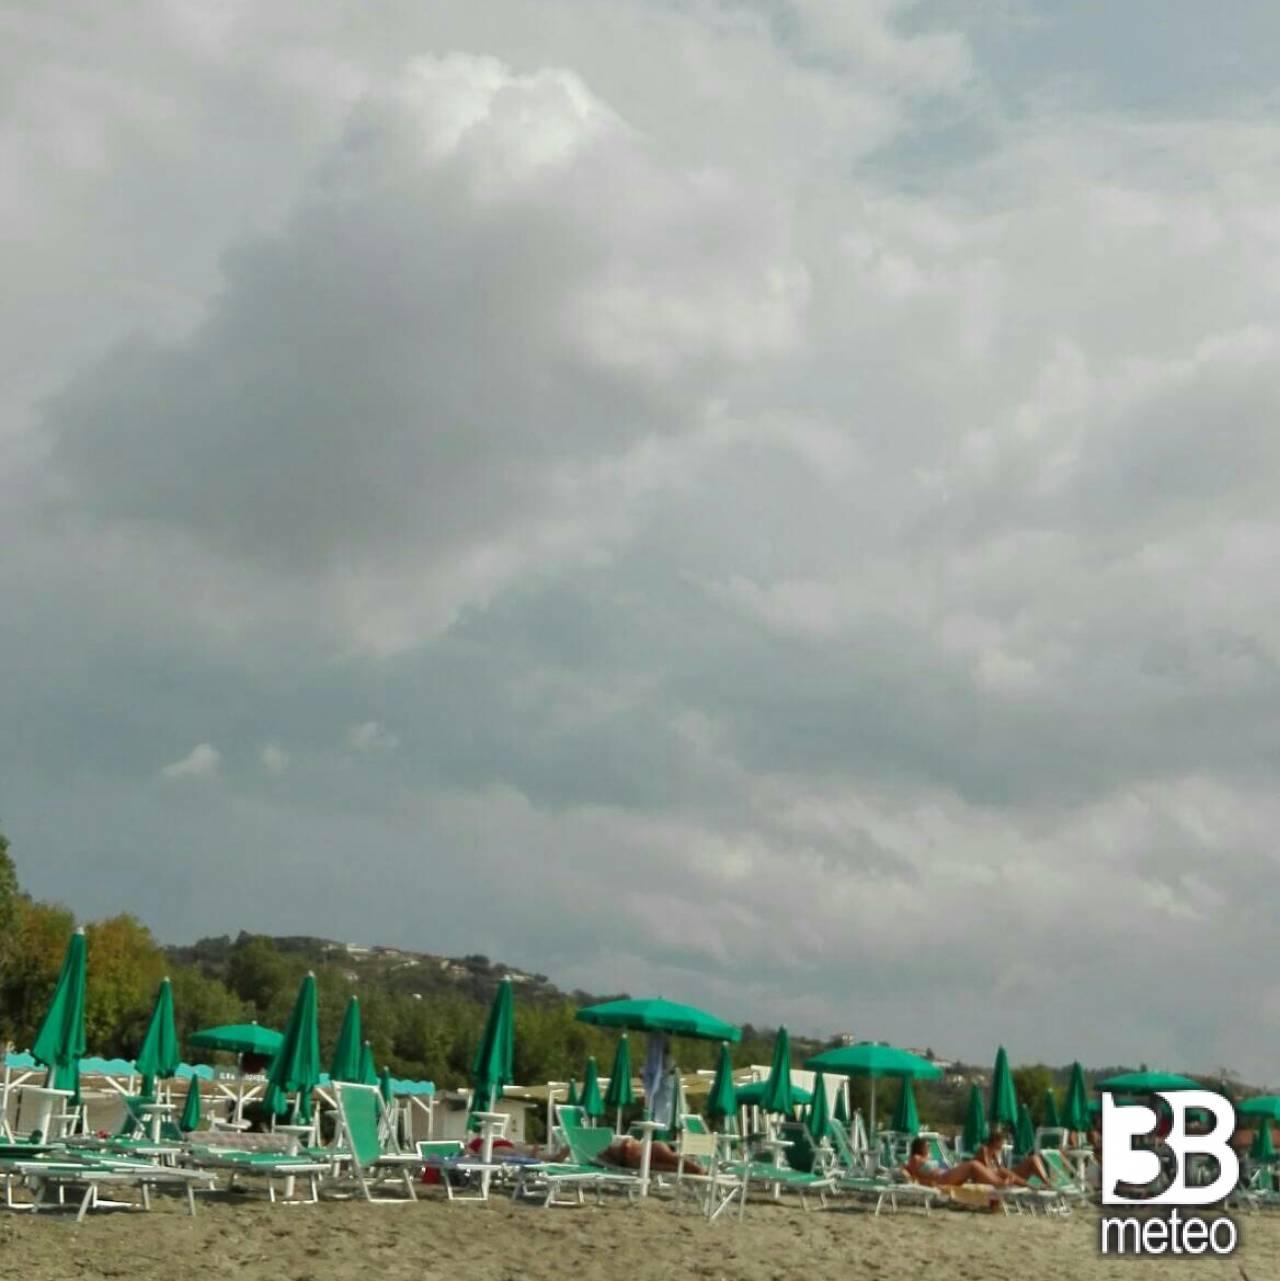 Fotosegnalazione di agropoli foto gallery 3b meteo - 3b meteo bagno di romagna ...